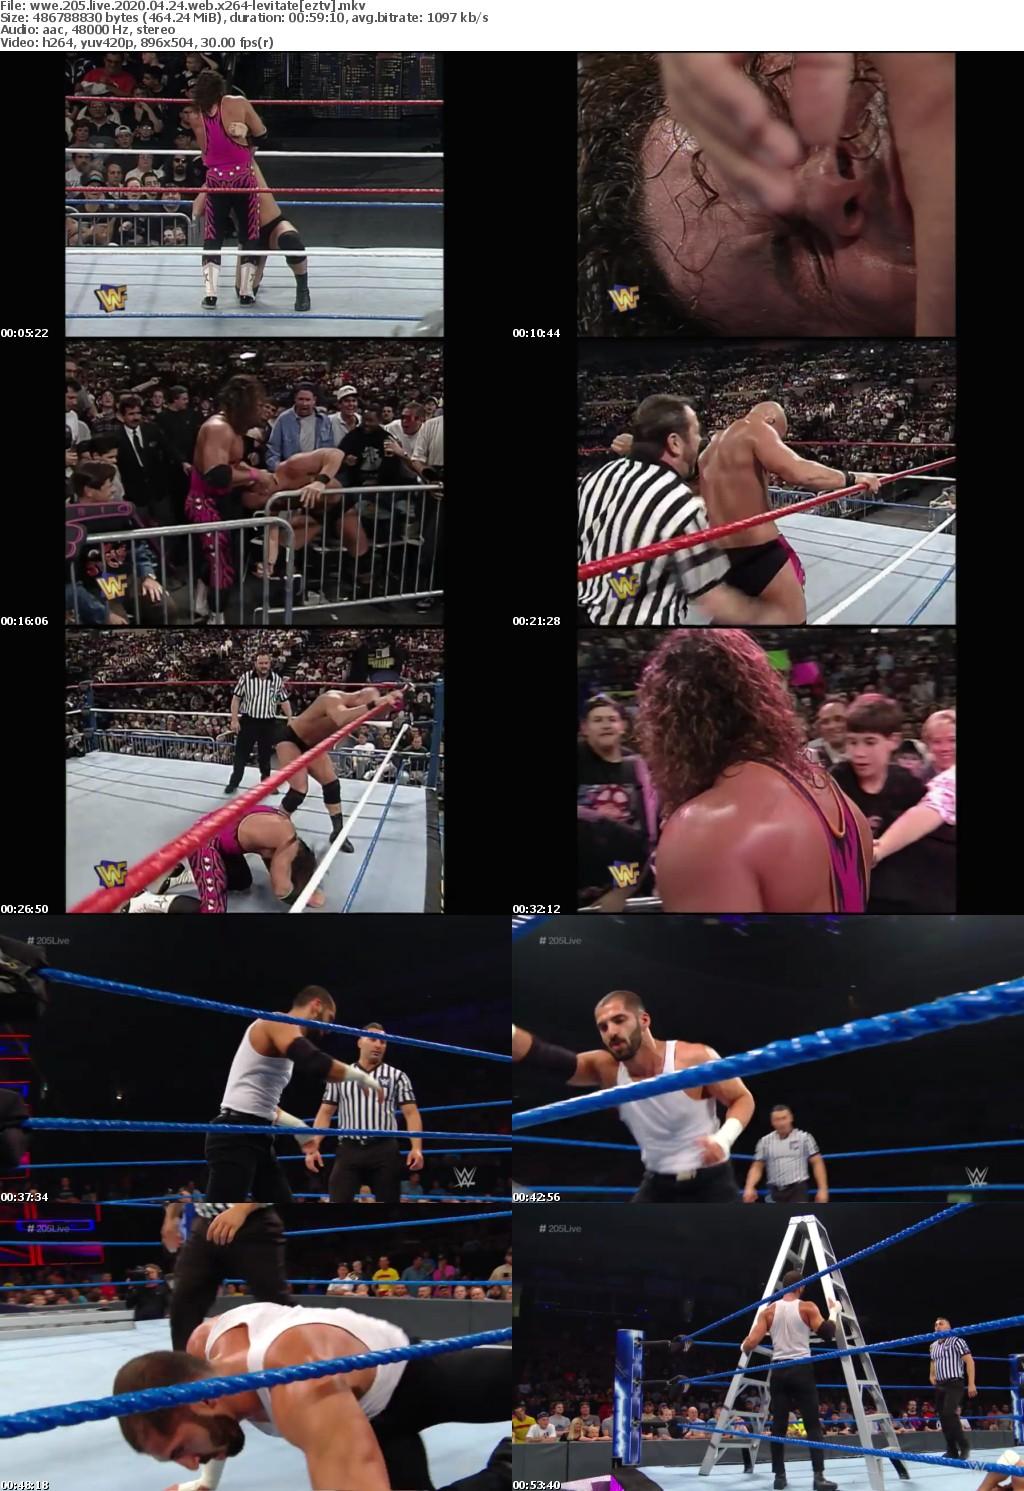 WWE 205 Live 2020 04 24 WEB x264-LEViTATE